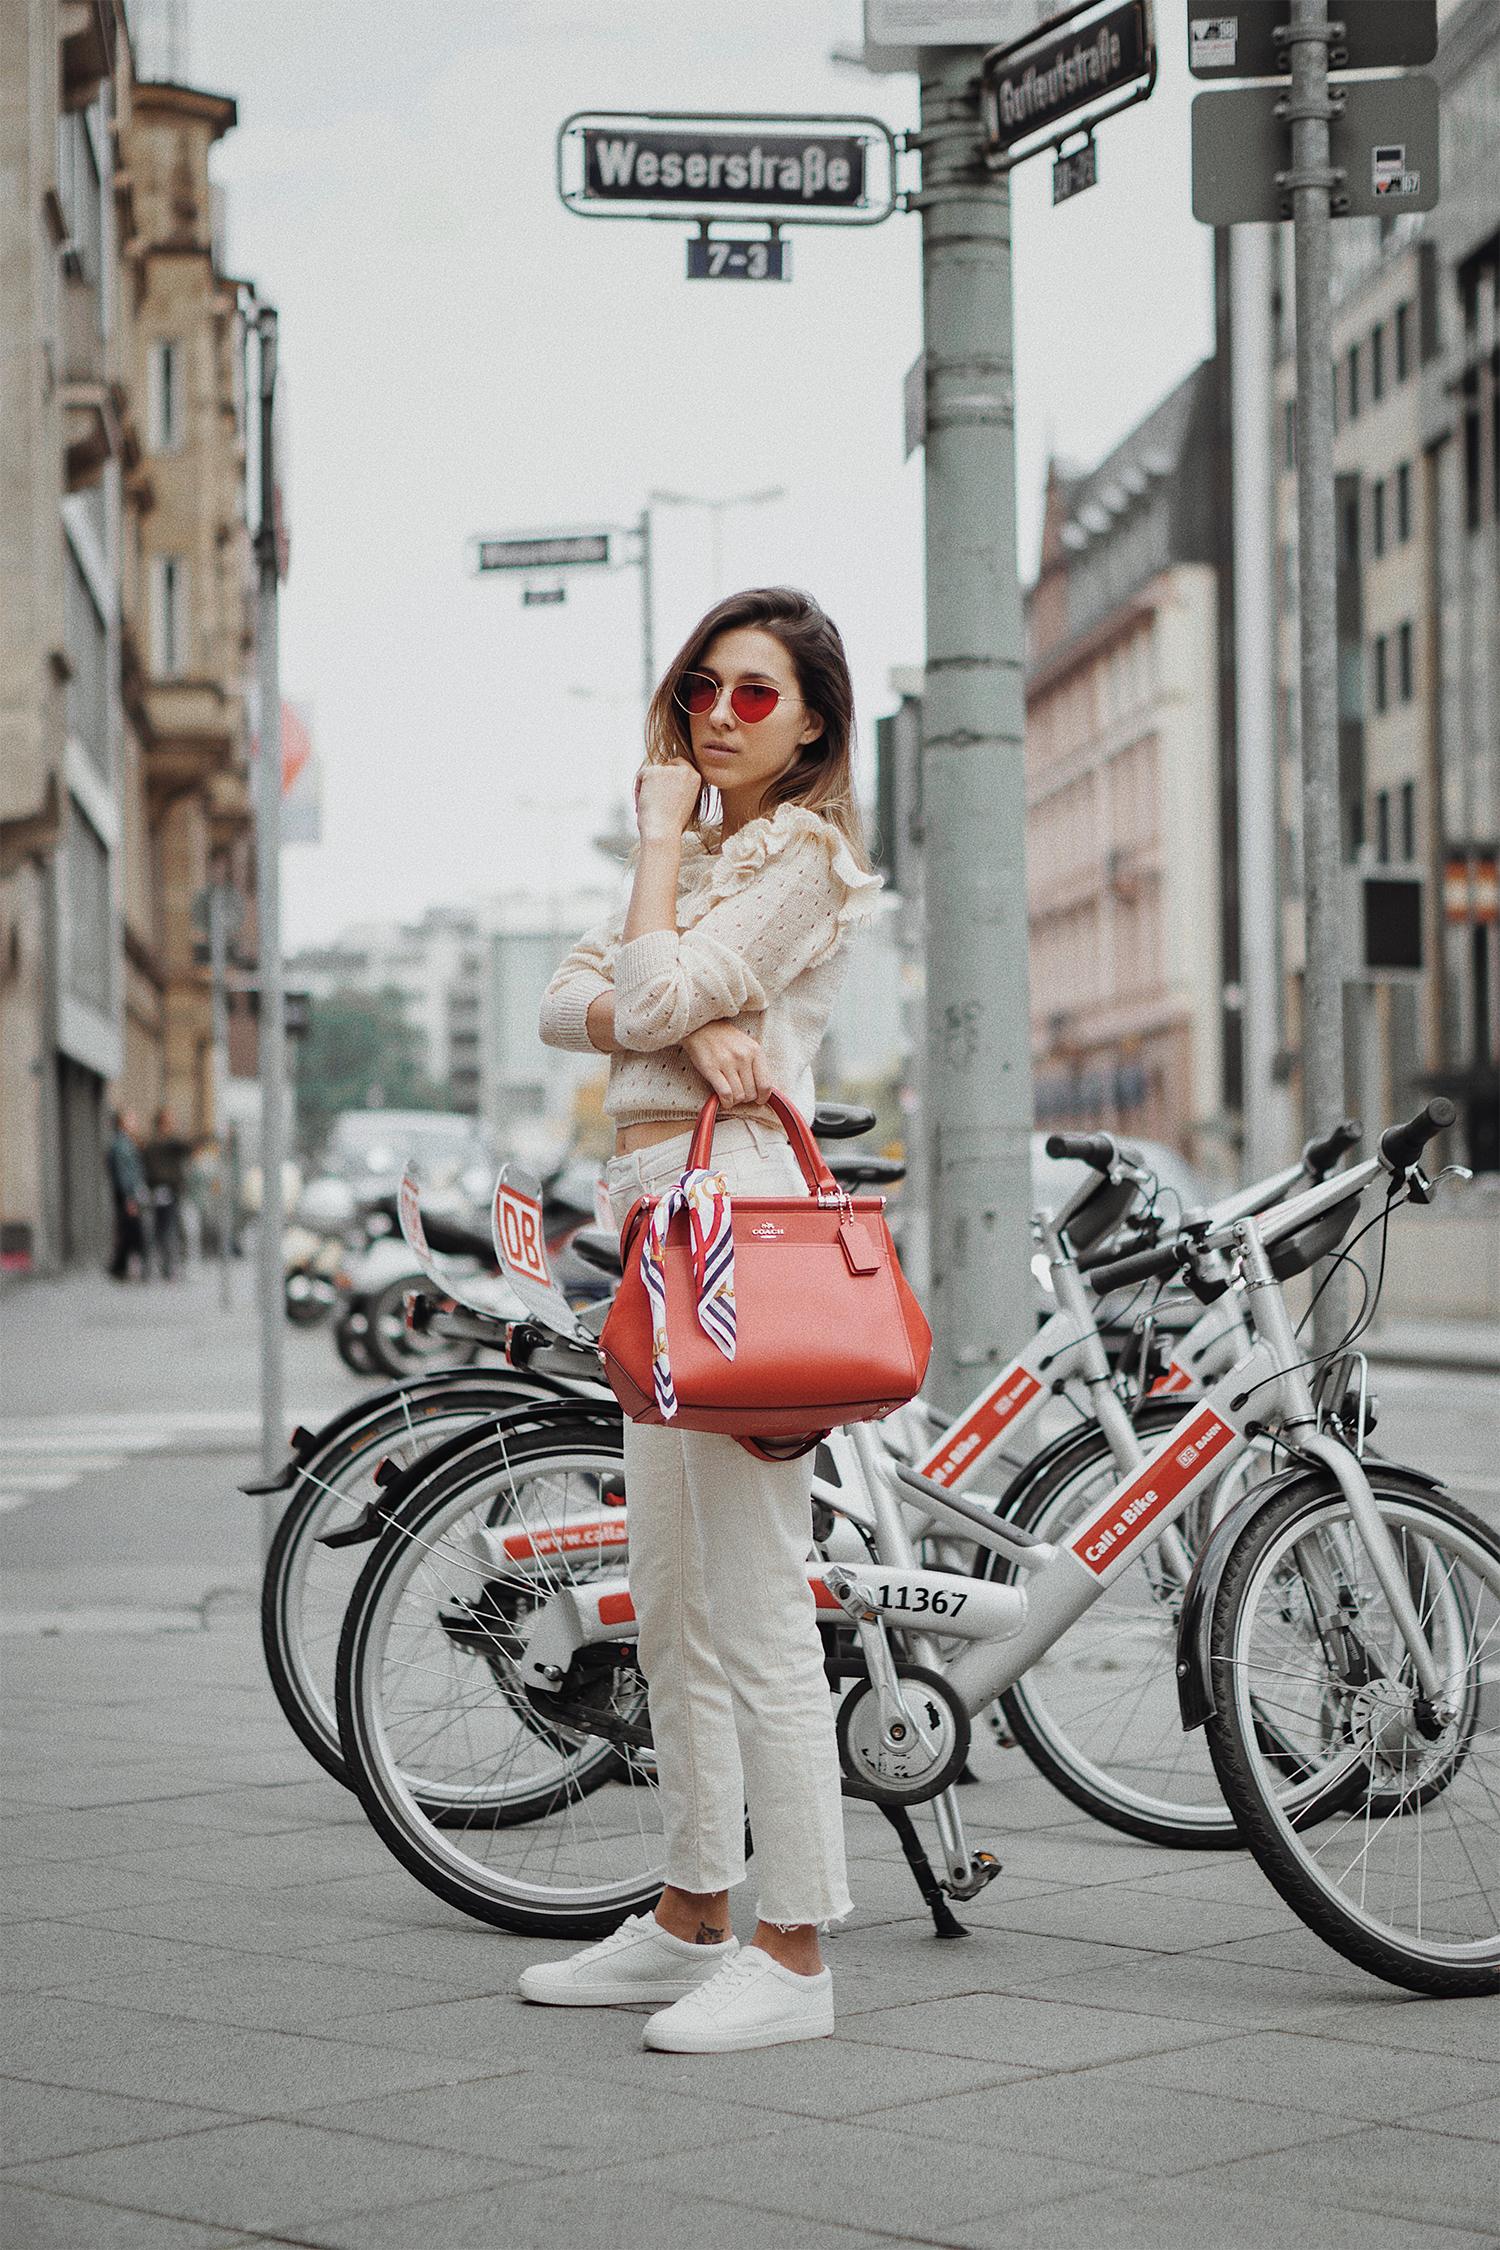 CoachxSelena_CoachNY_thewhiteocean_frankfurt_lenajuice_01